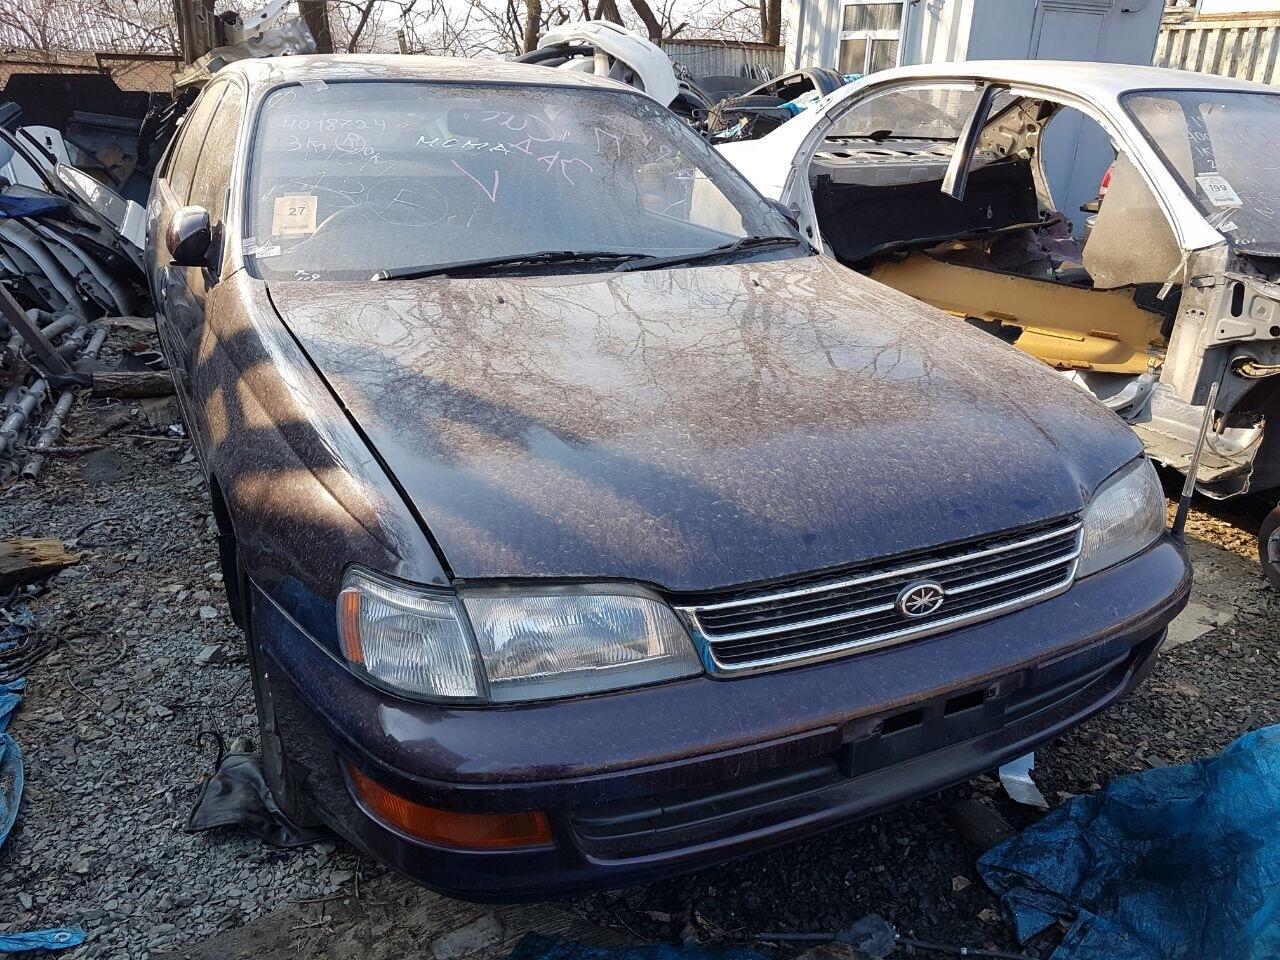 Toyota Corona St190, Toyota Corona St190 Suppliers and ...